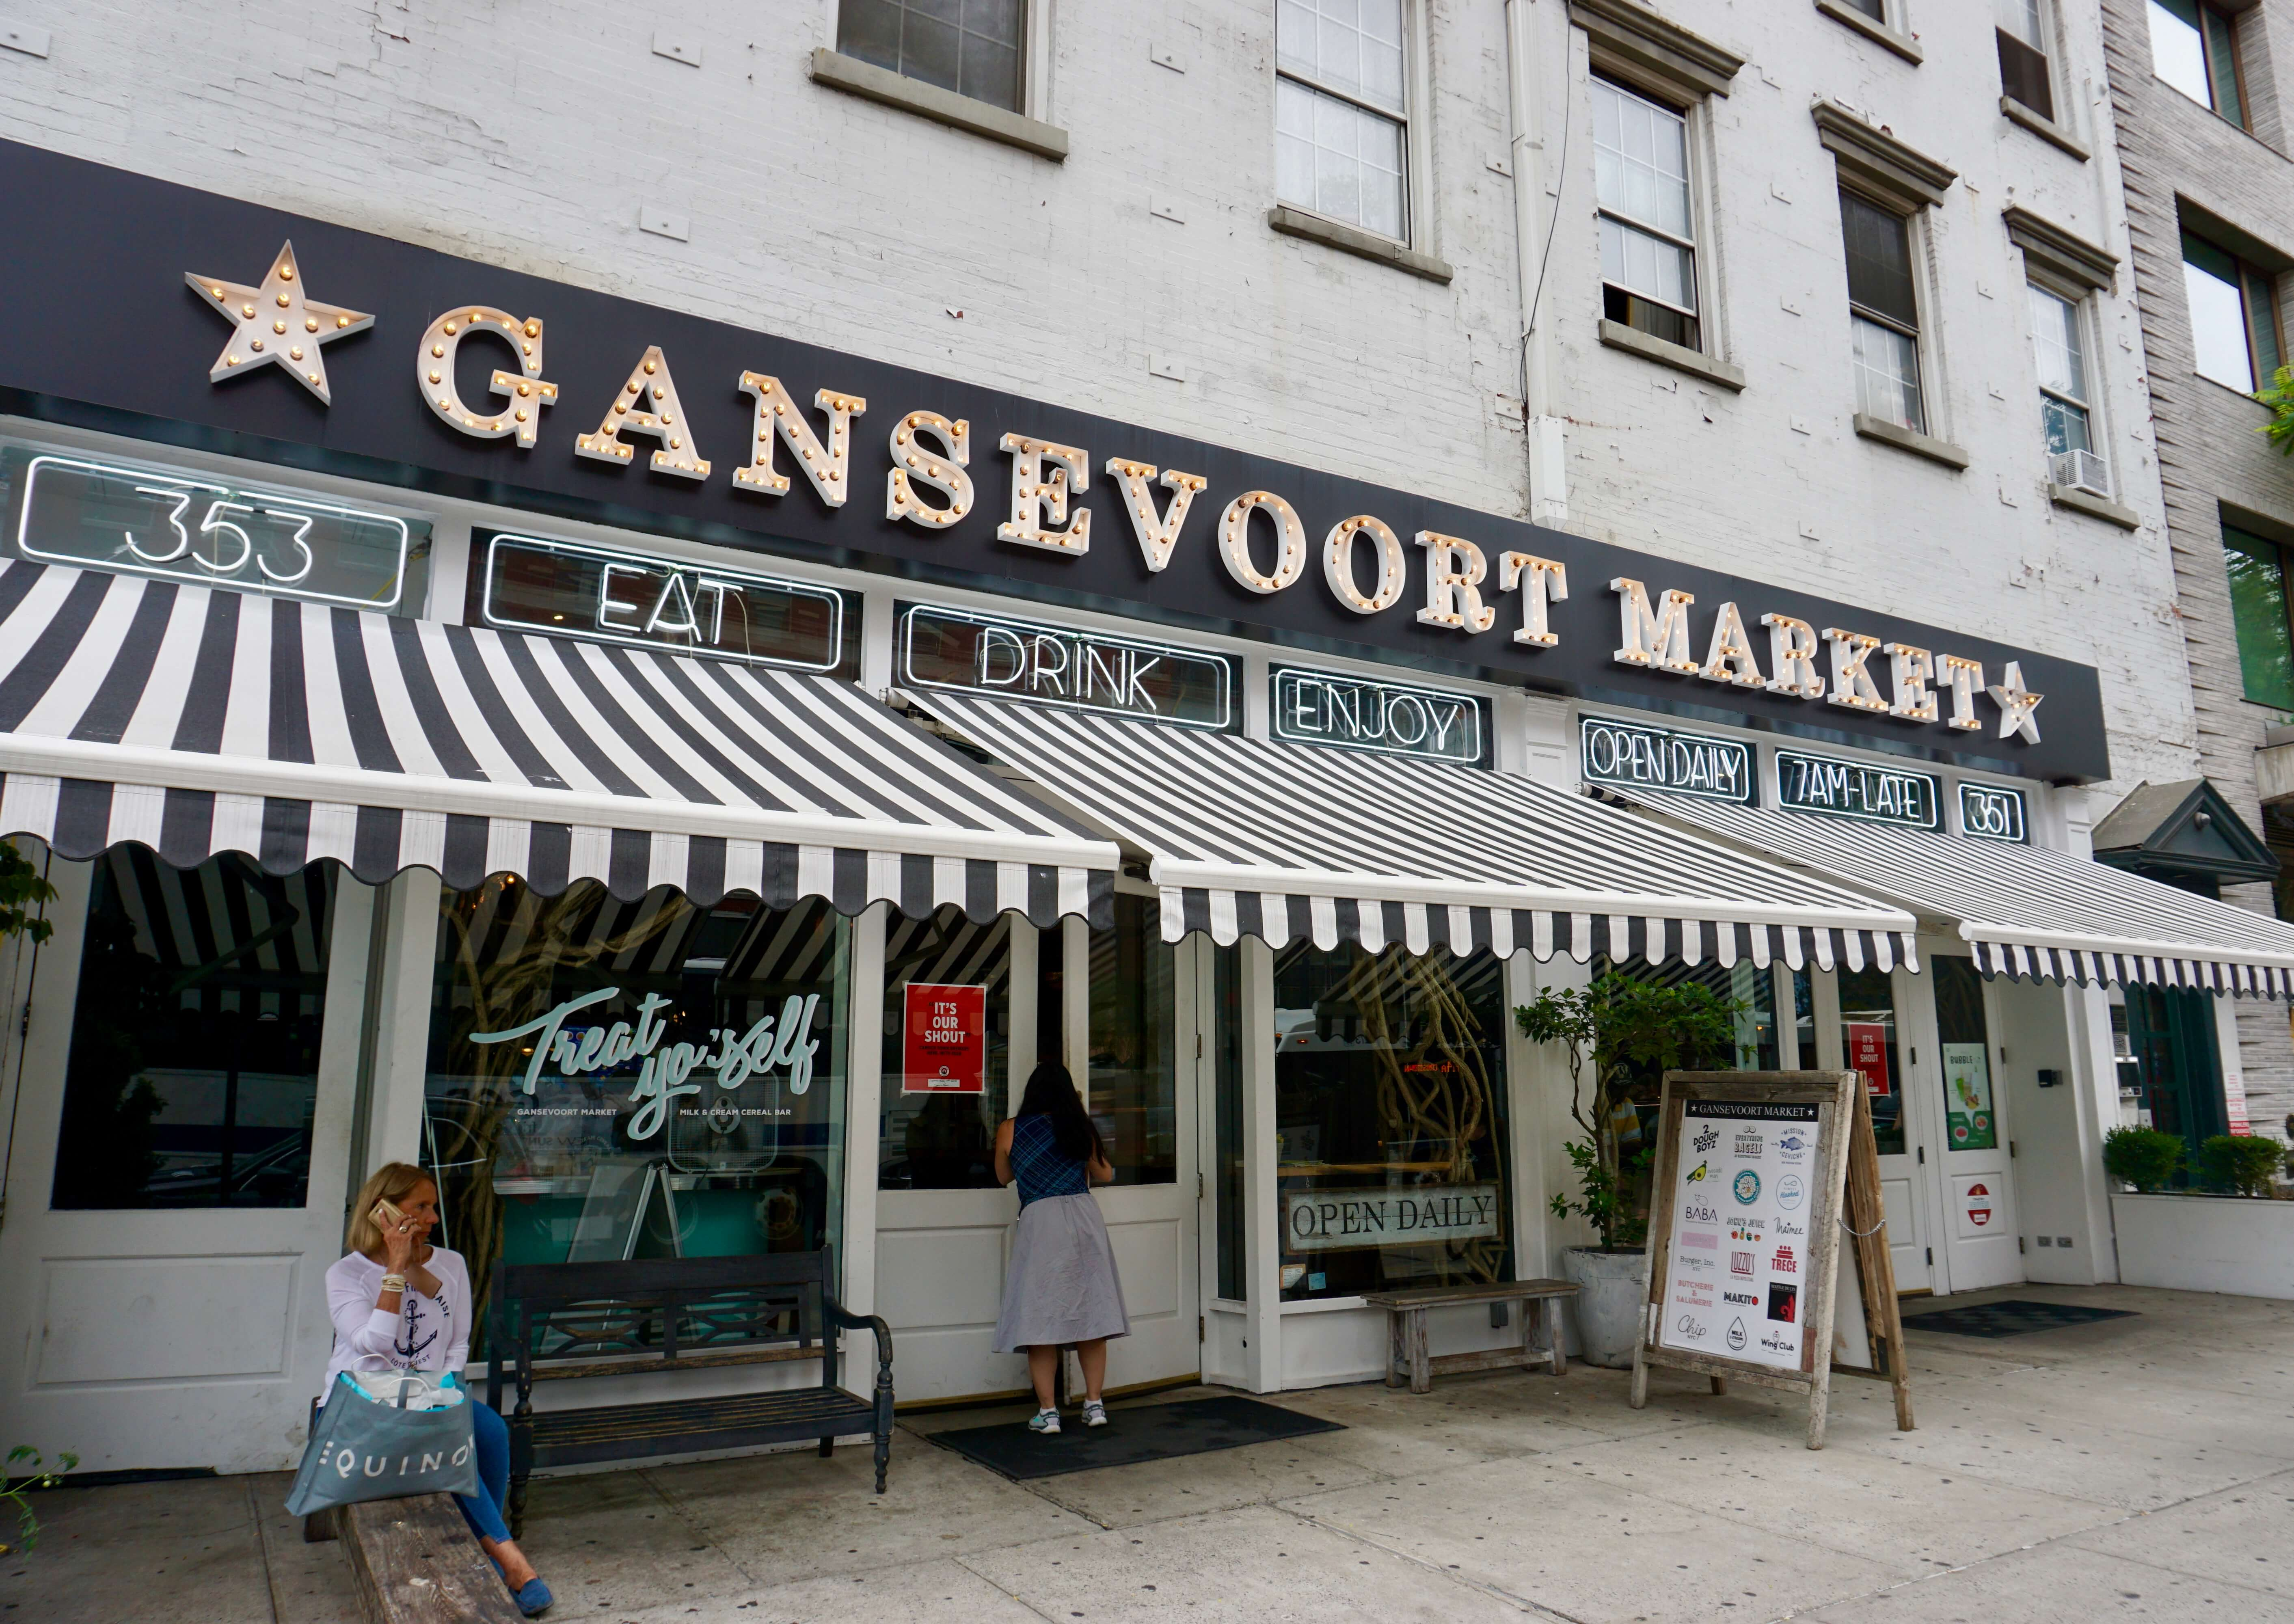 Gansevoort Market in Chelsea